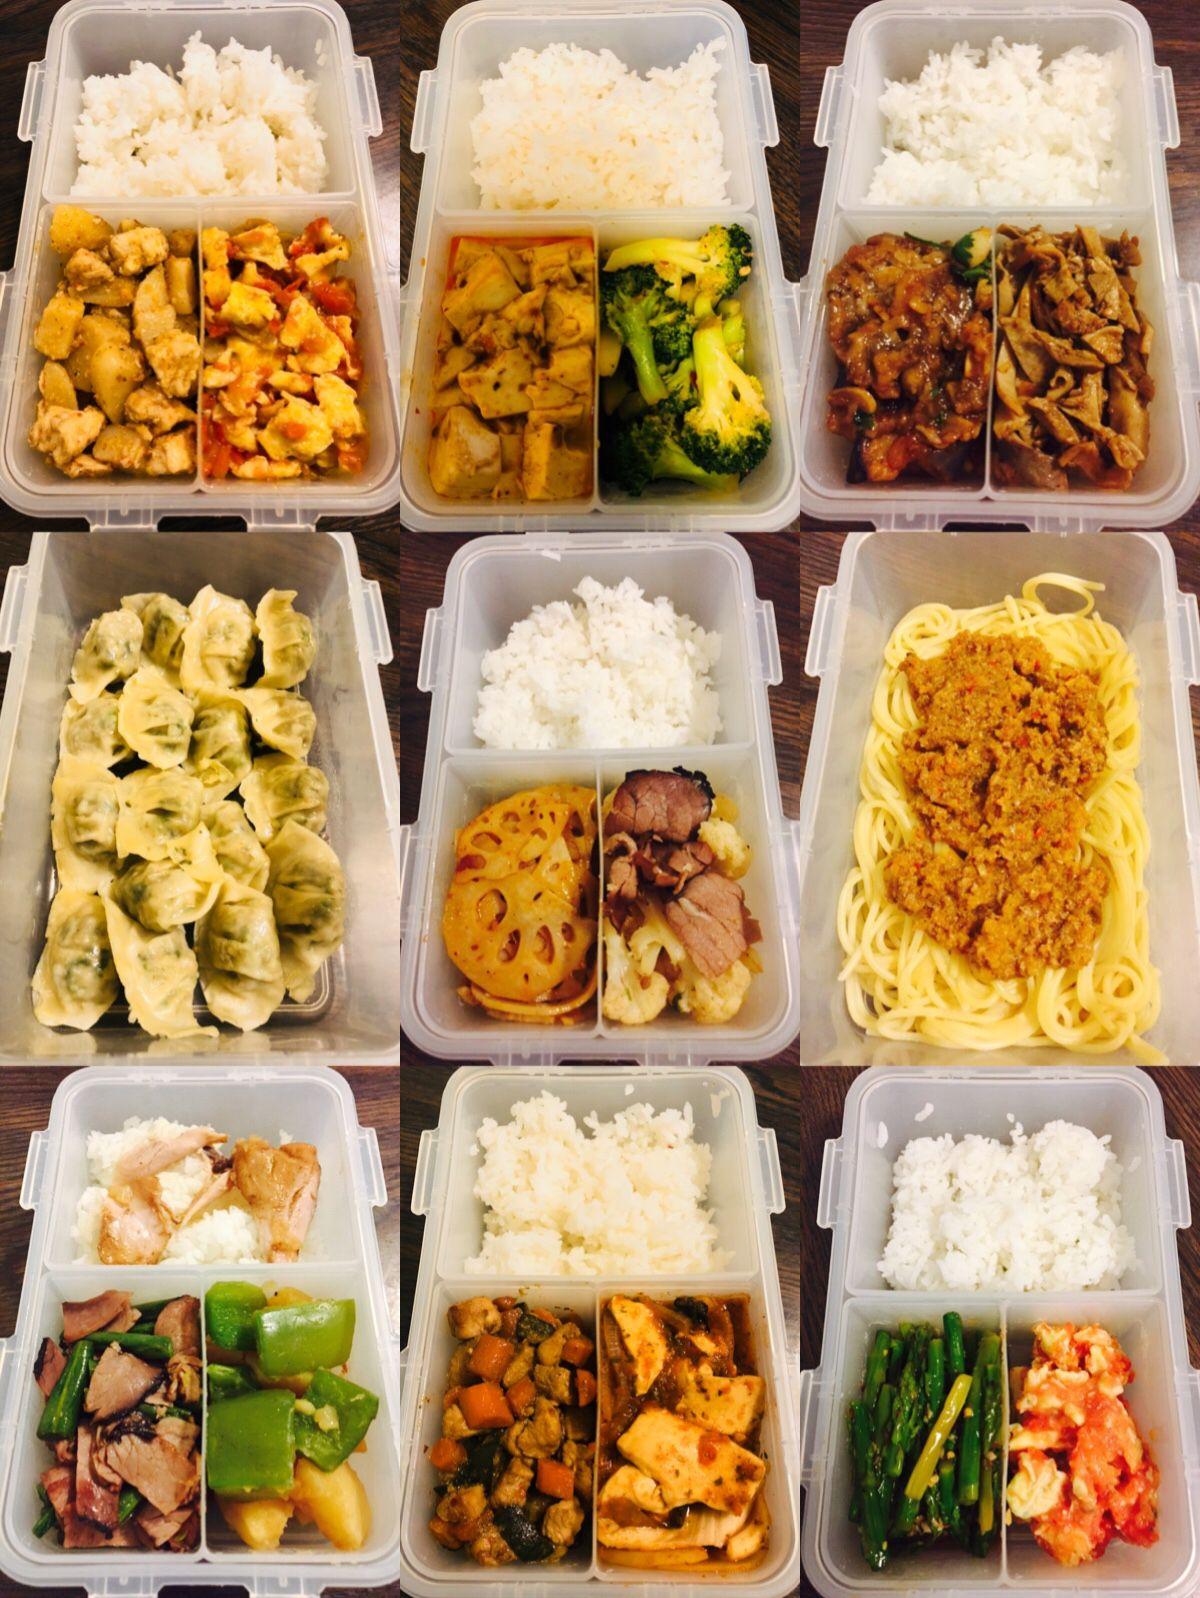 Pin Oleh Qian Hao Di Lunch Box Makan Siang Ide Makanan Makanan Dan Minuman